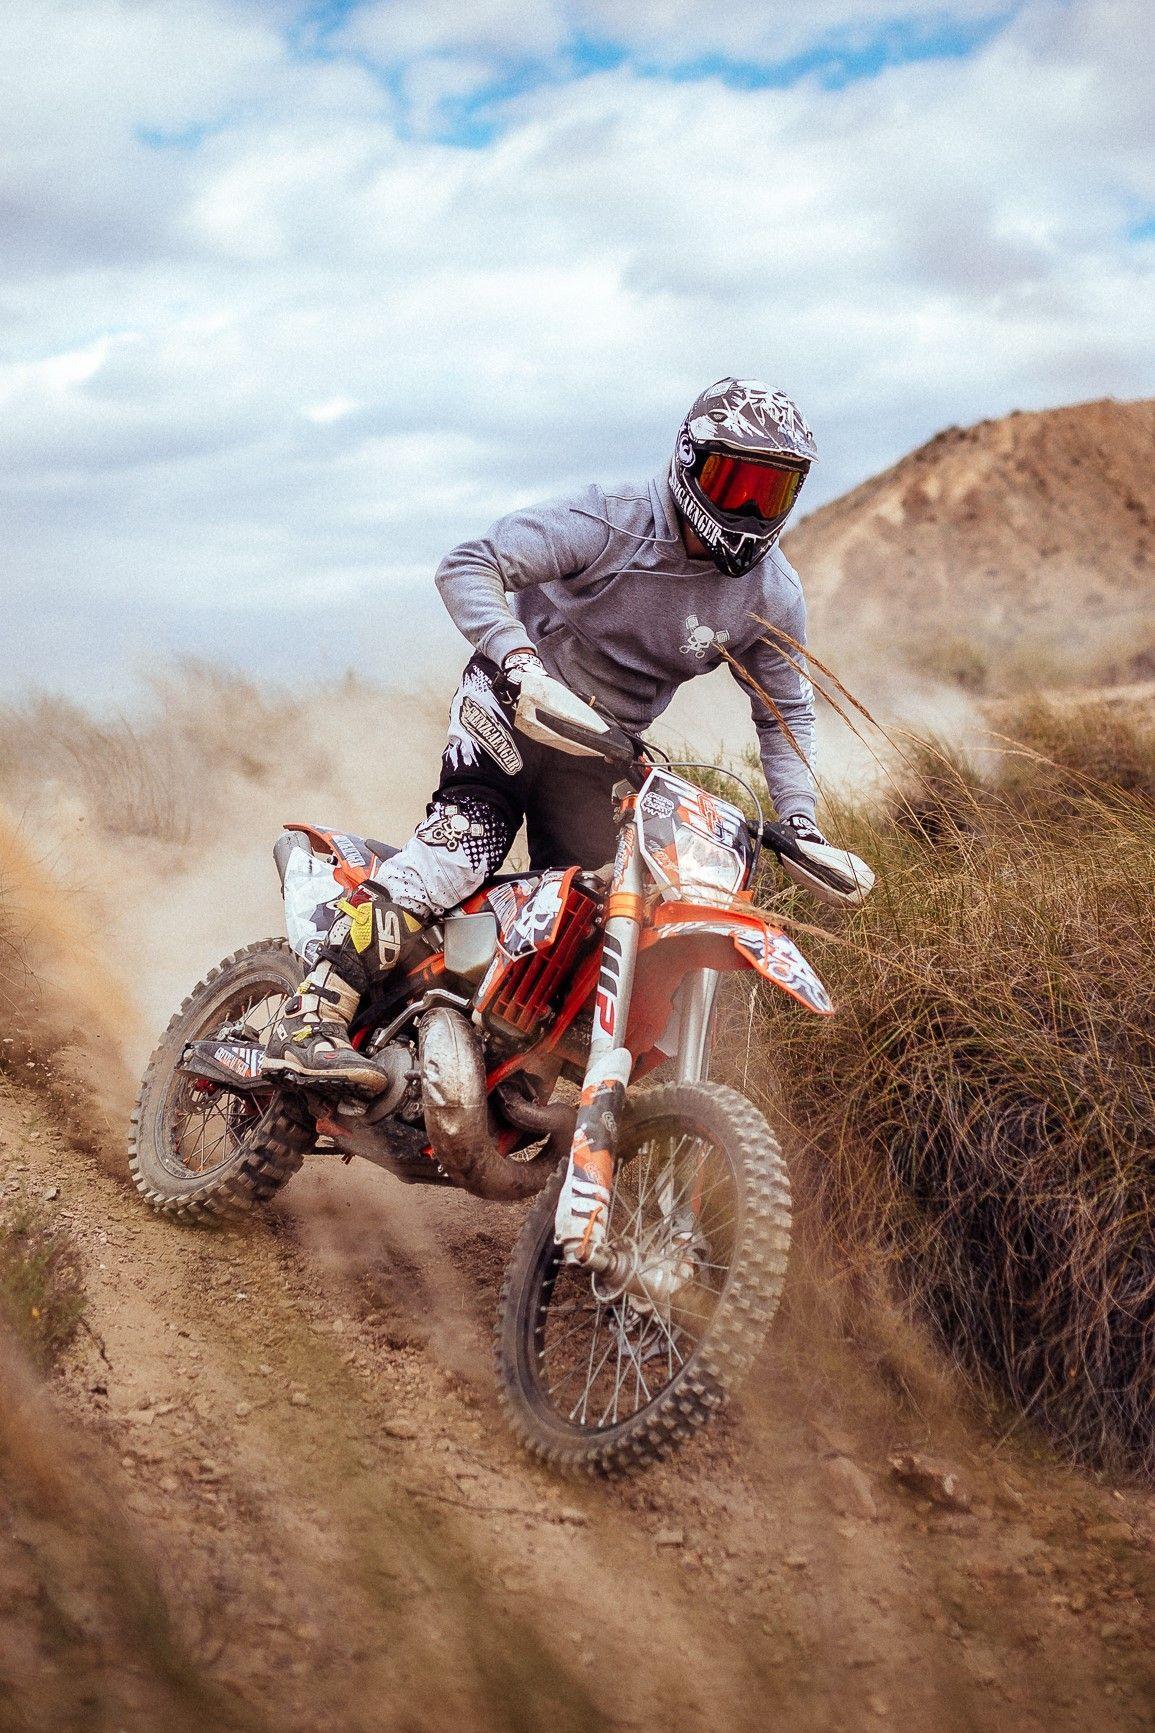 x9 Colours Motocross Kids Hoodie Off Road Racing Motorbike Trials Stunt